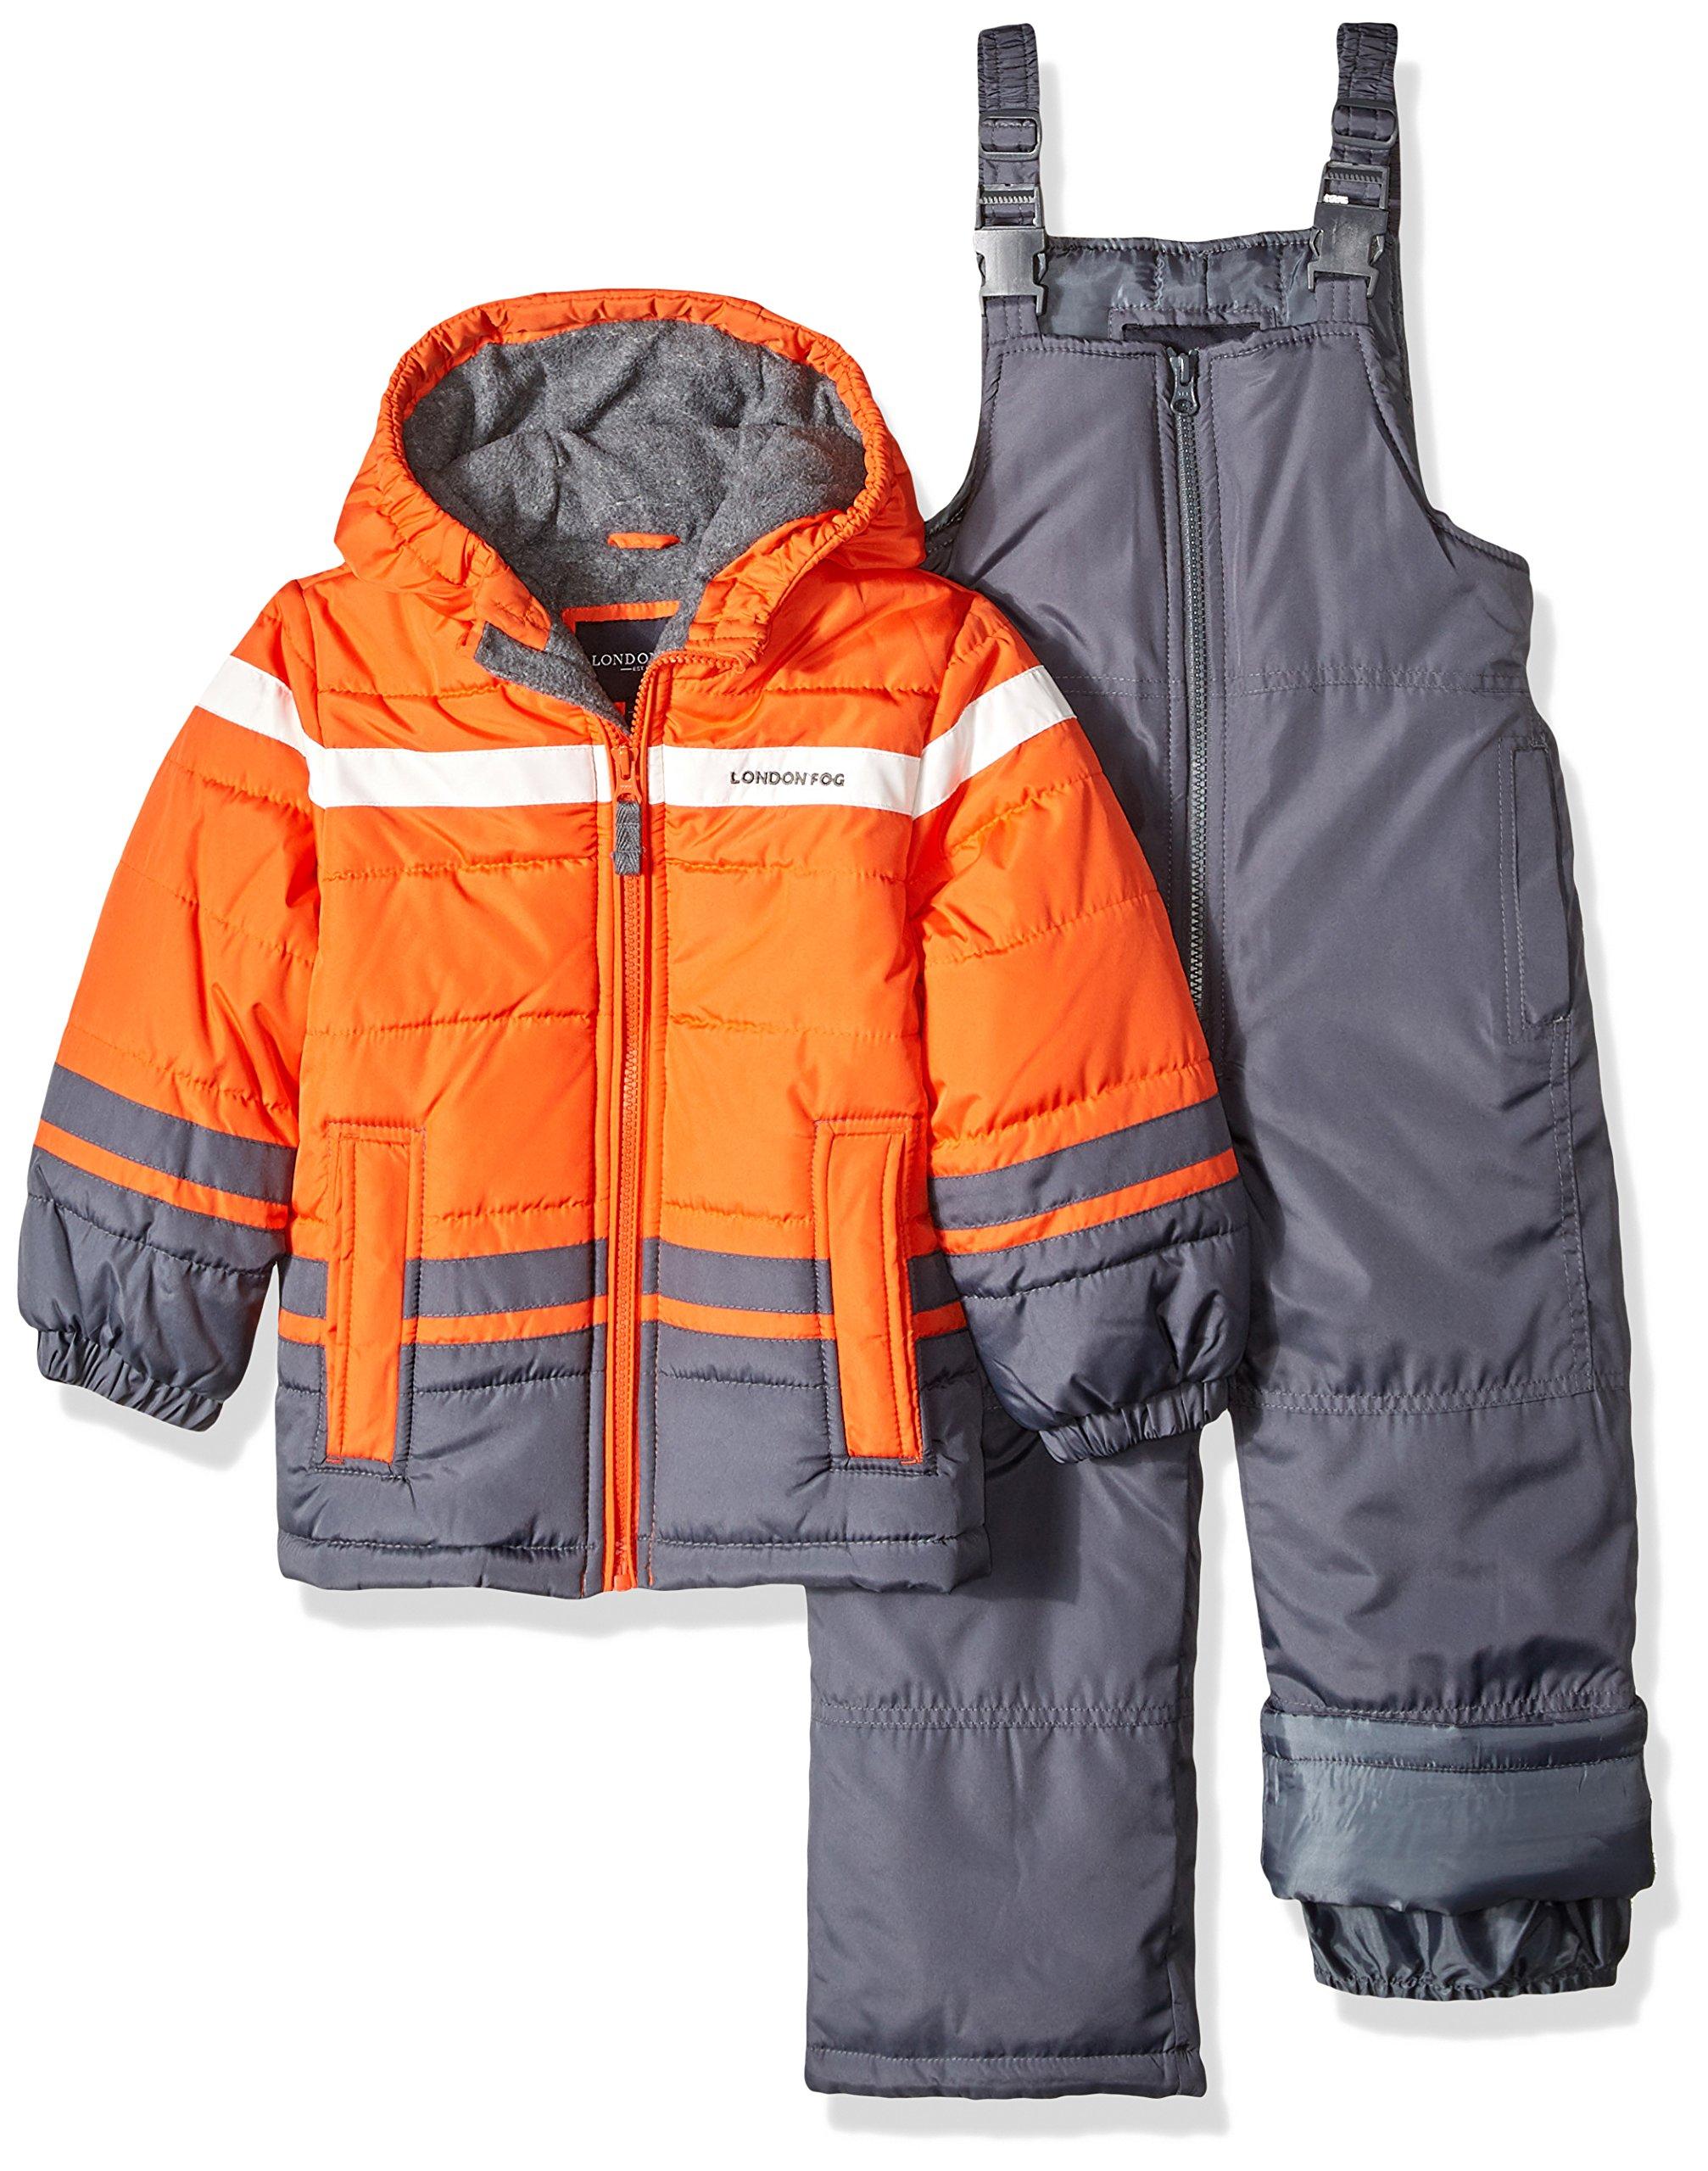 London Fog Boys' Toddler 2-Piece Snow Pant & Jacket Snowsuit, Orange, 2T by London Fog